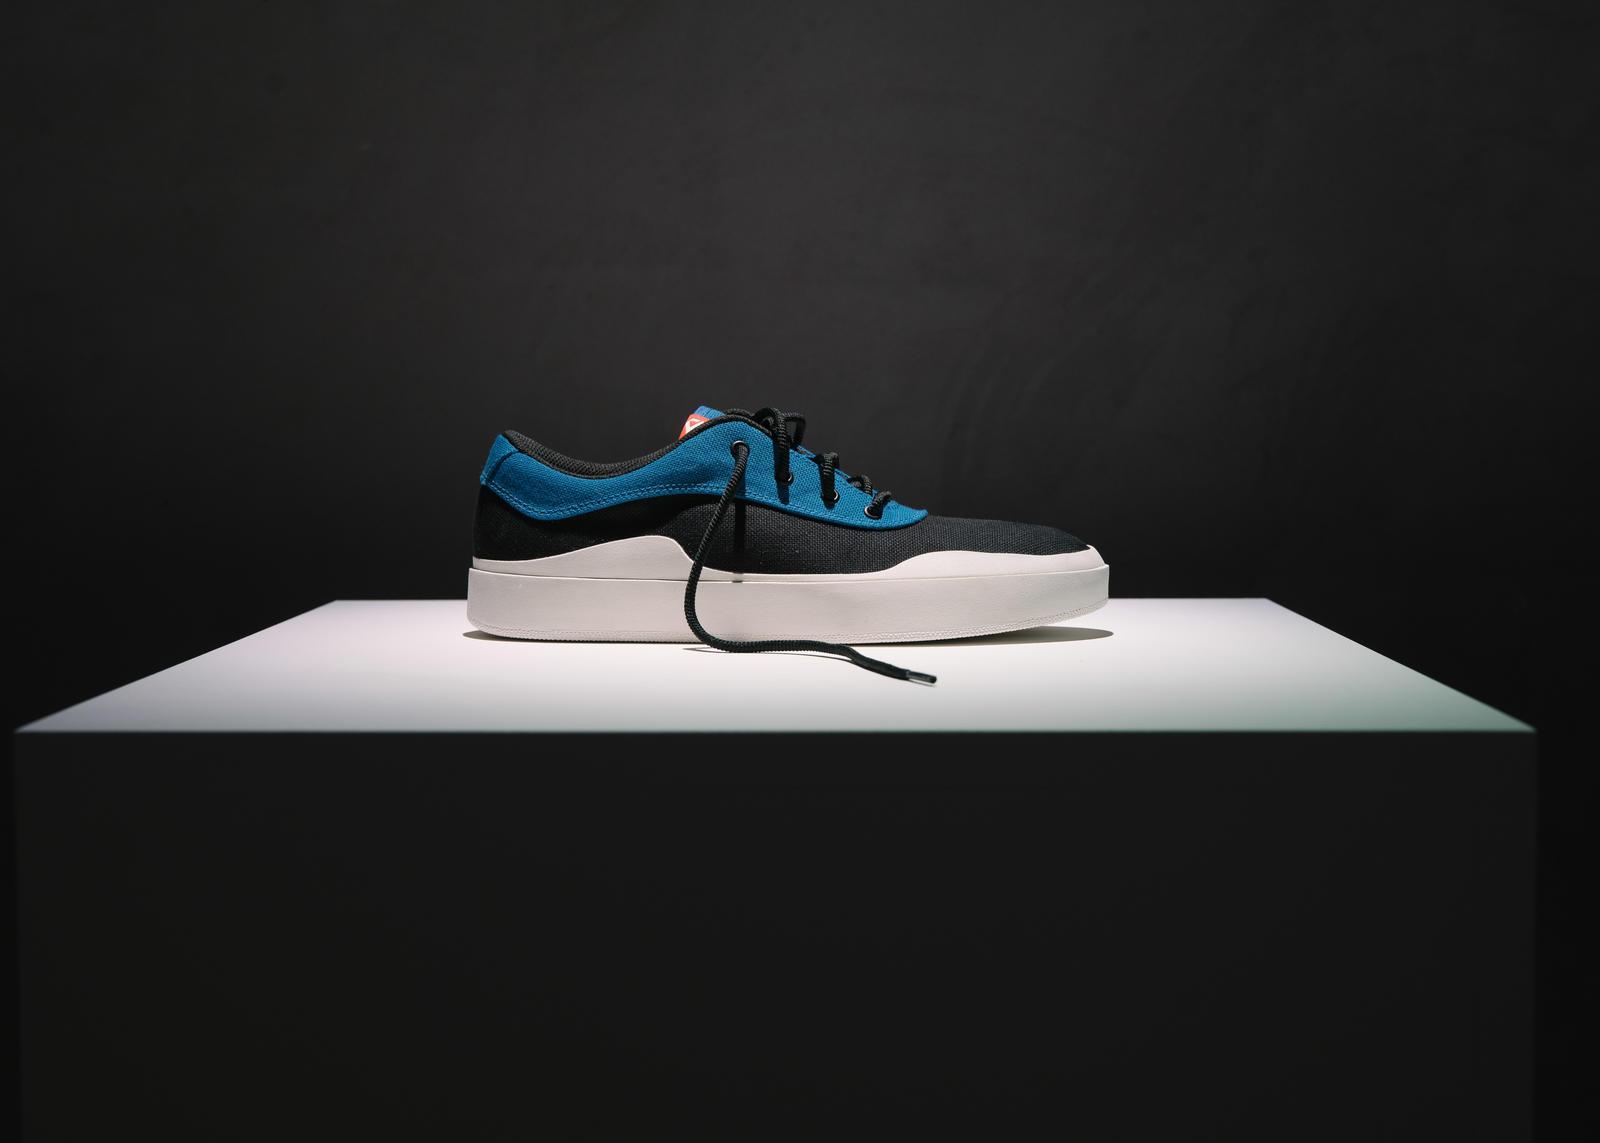 sports shoes 8e412 e54f0 Jordan Brand Fall 2018 Preview 59